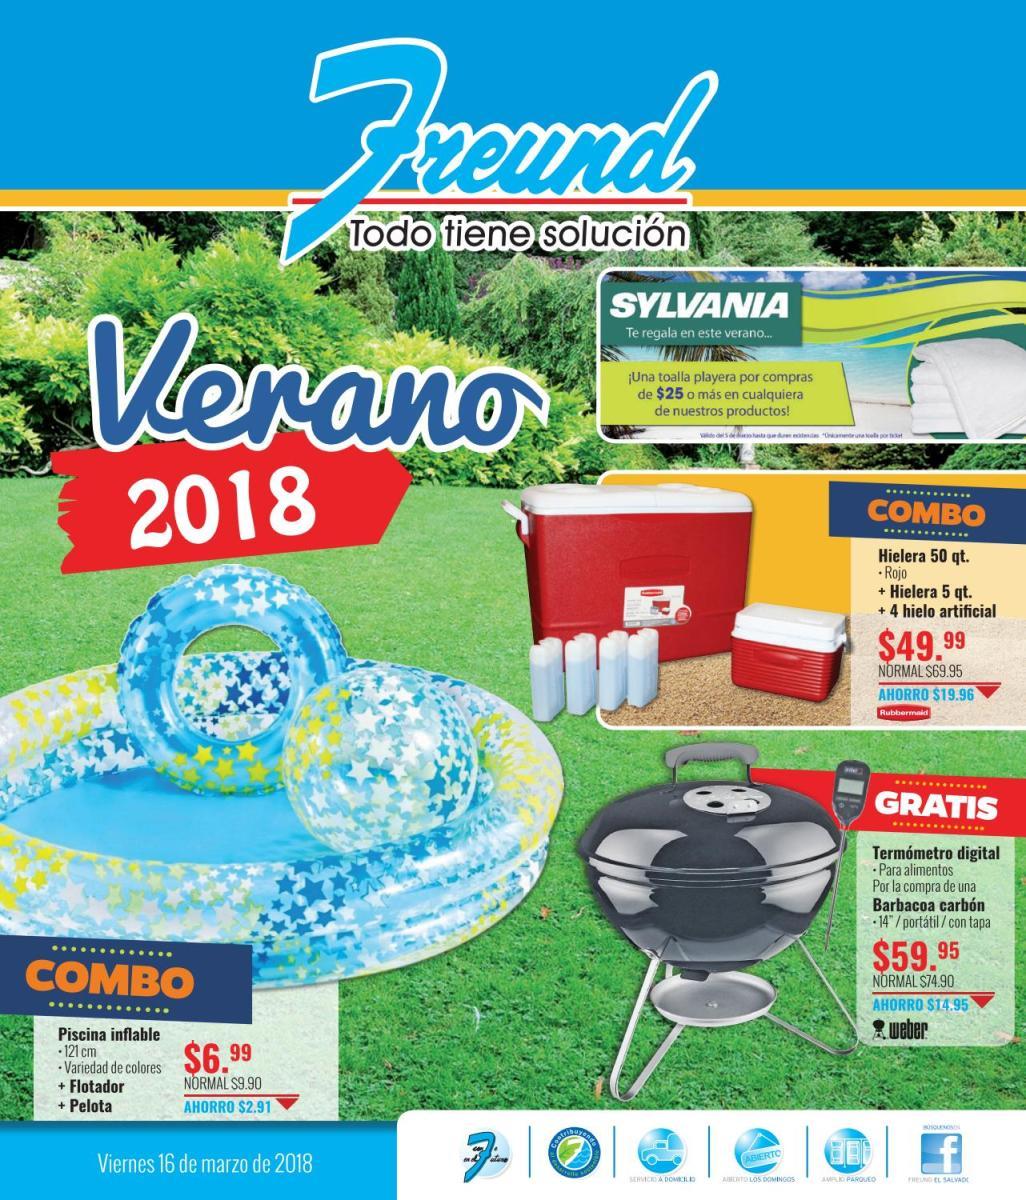 Cuadernillo Vacación Marzo 2018, Ferreterias FREUND